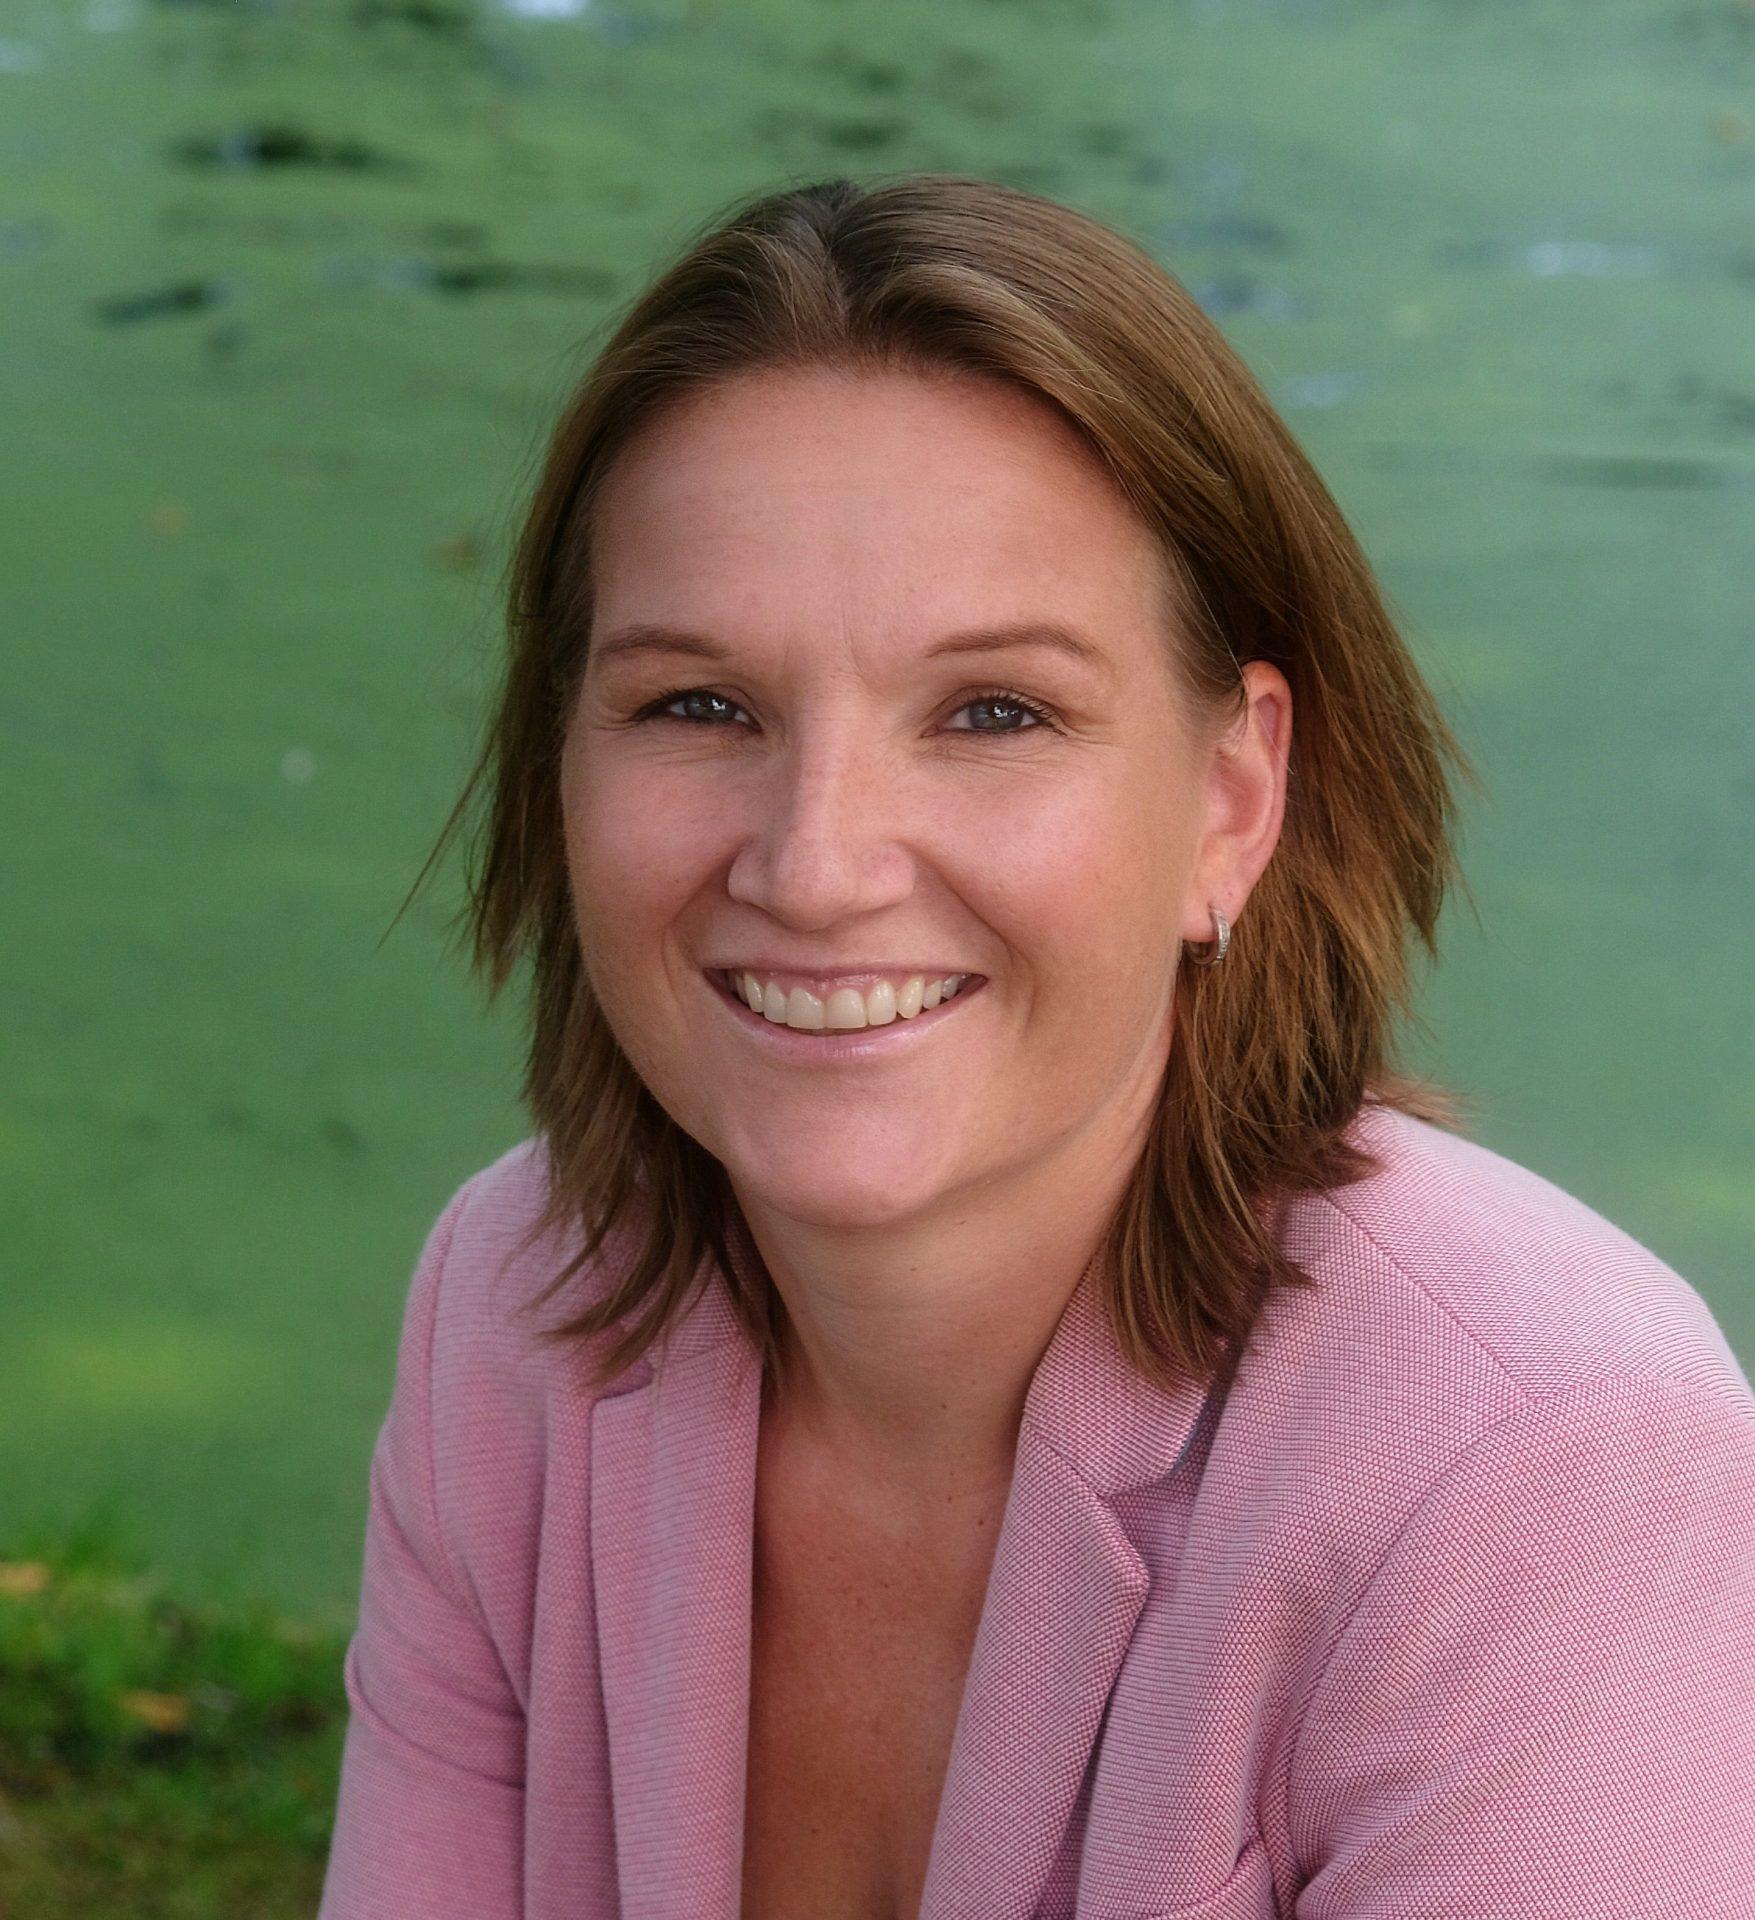 Nicole Hermans Personal Life Coaching